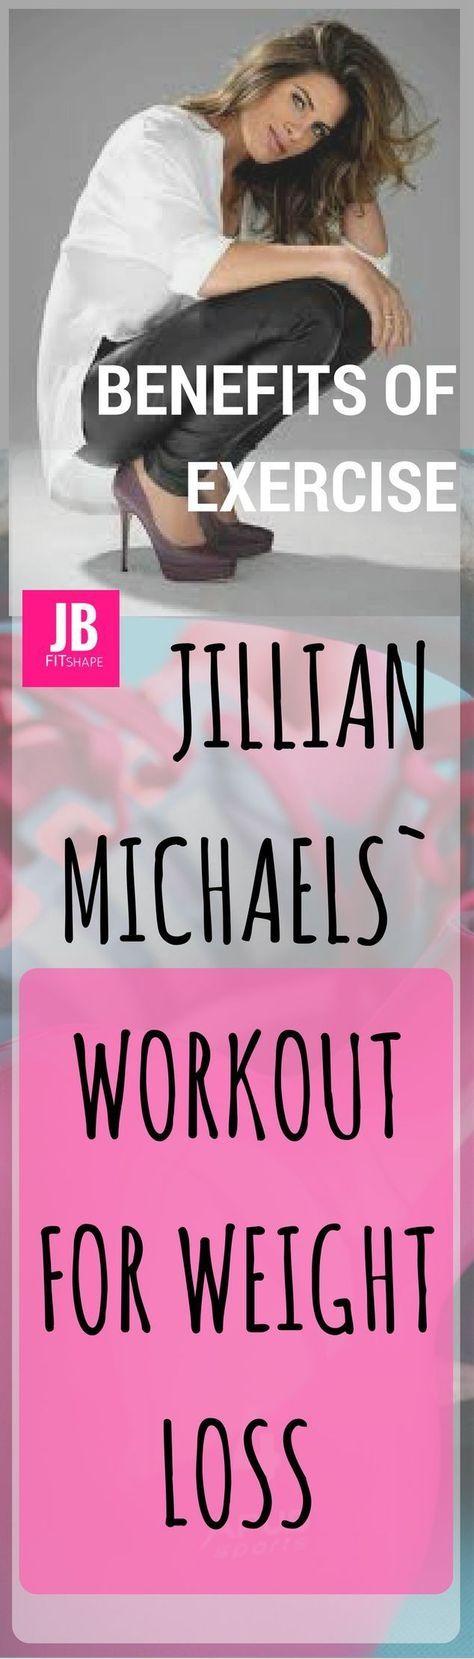 jillian michaels weight loss workouts